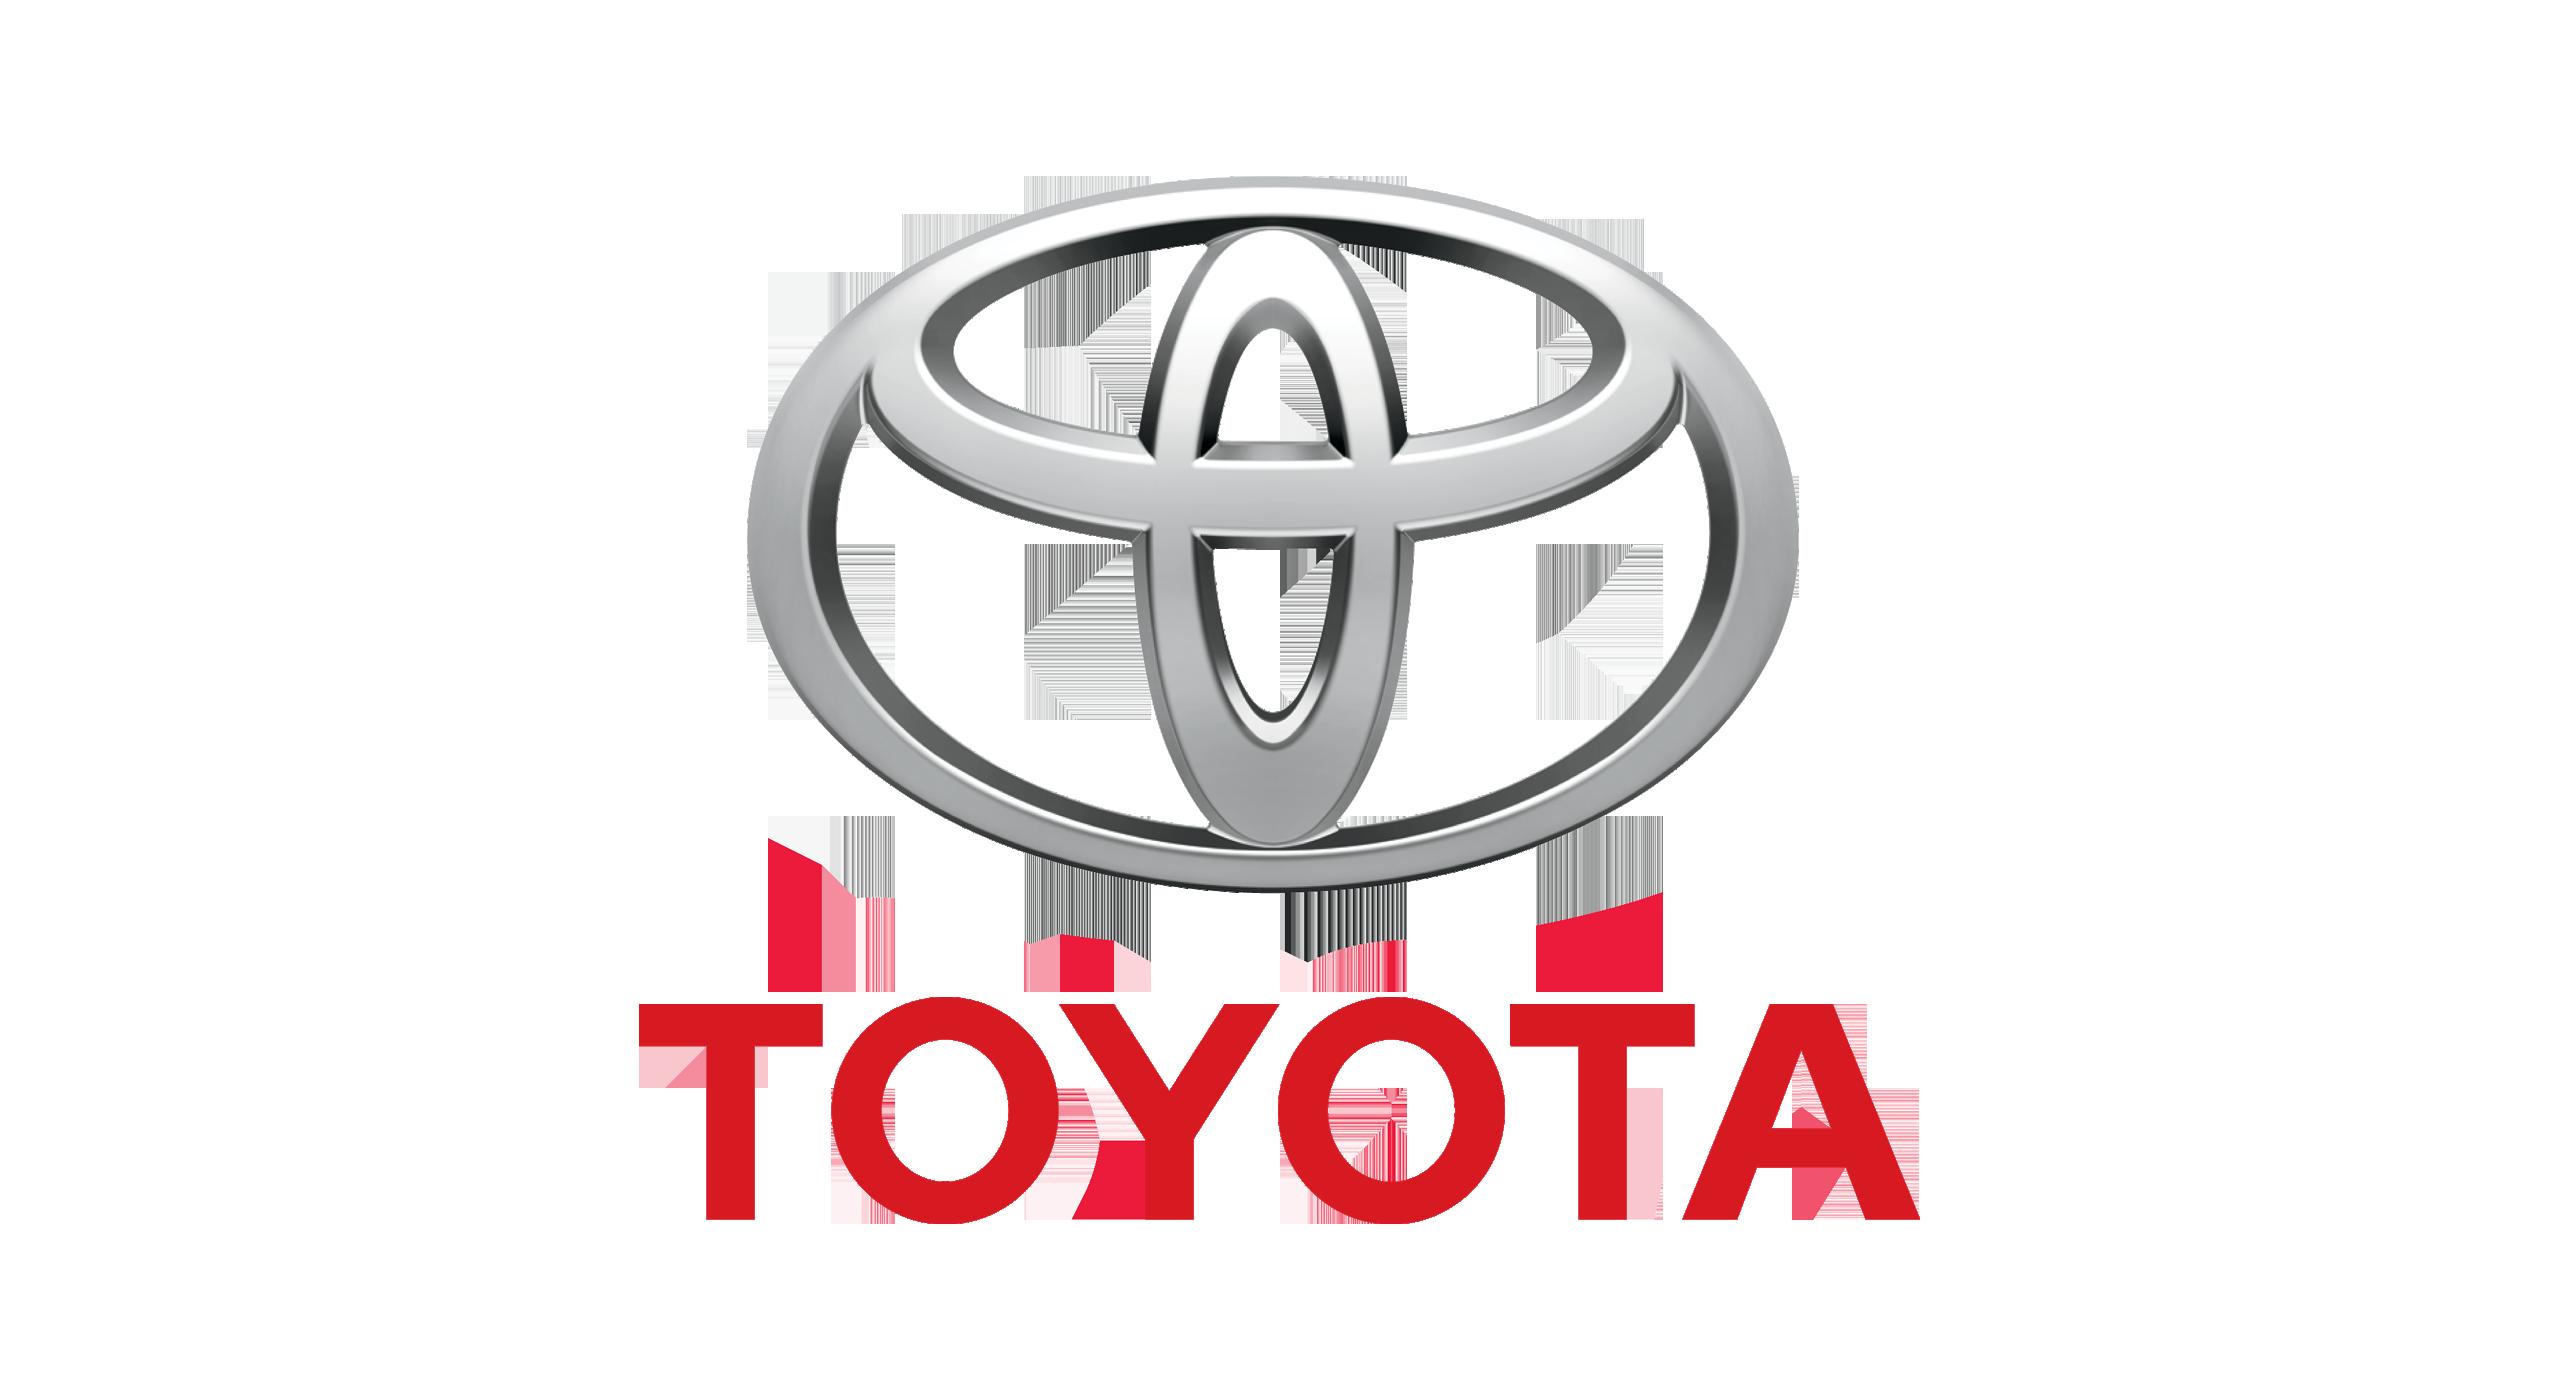 Toyota Logo (1989-Present) 2560x1440 HD png - Toyota PNG